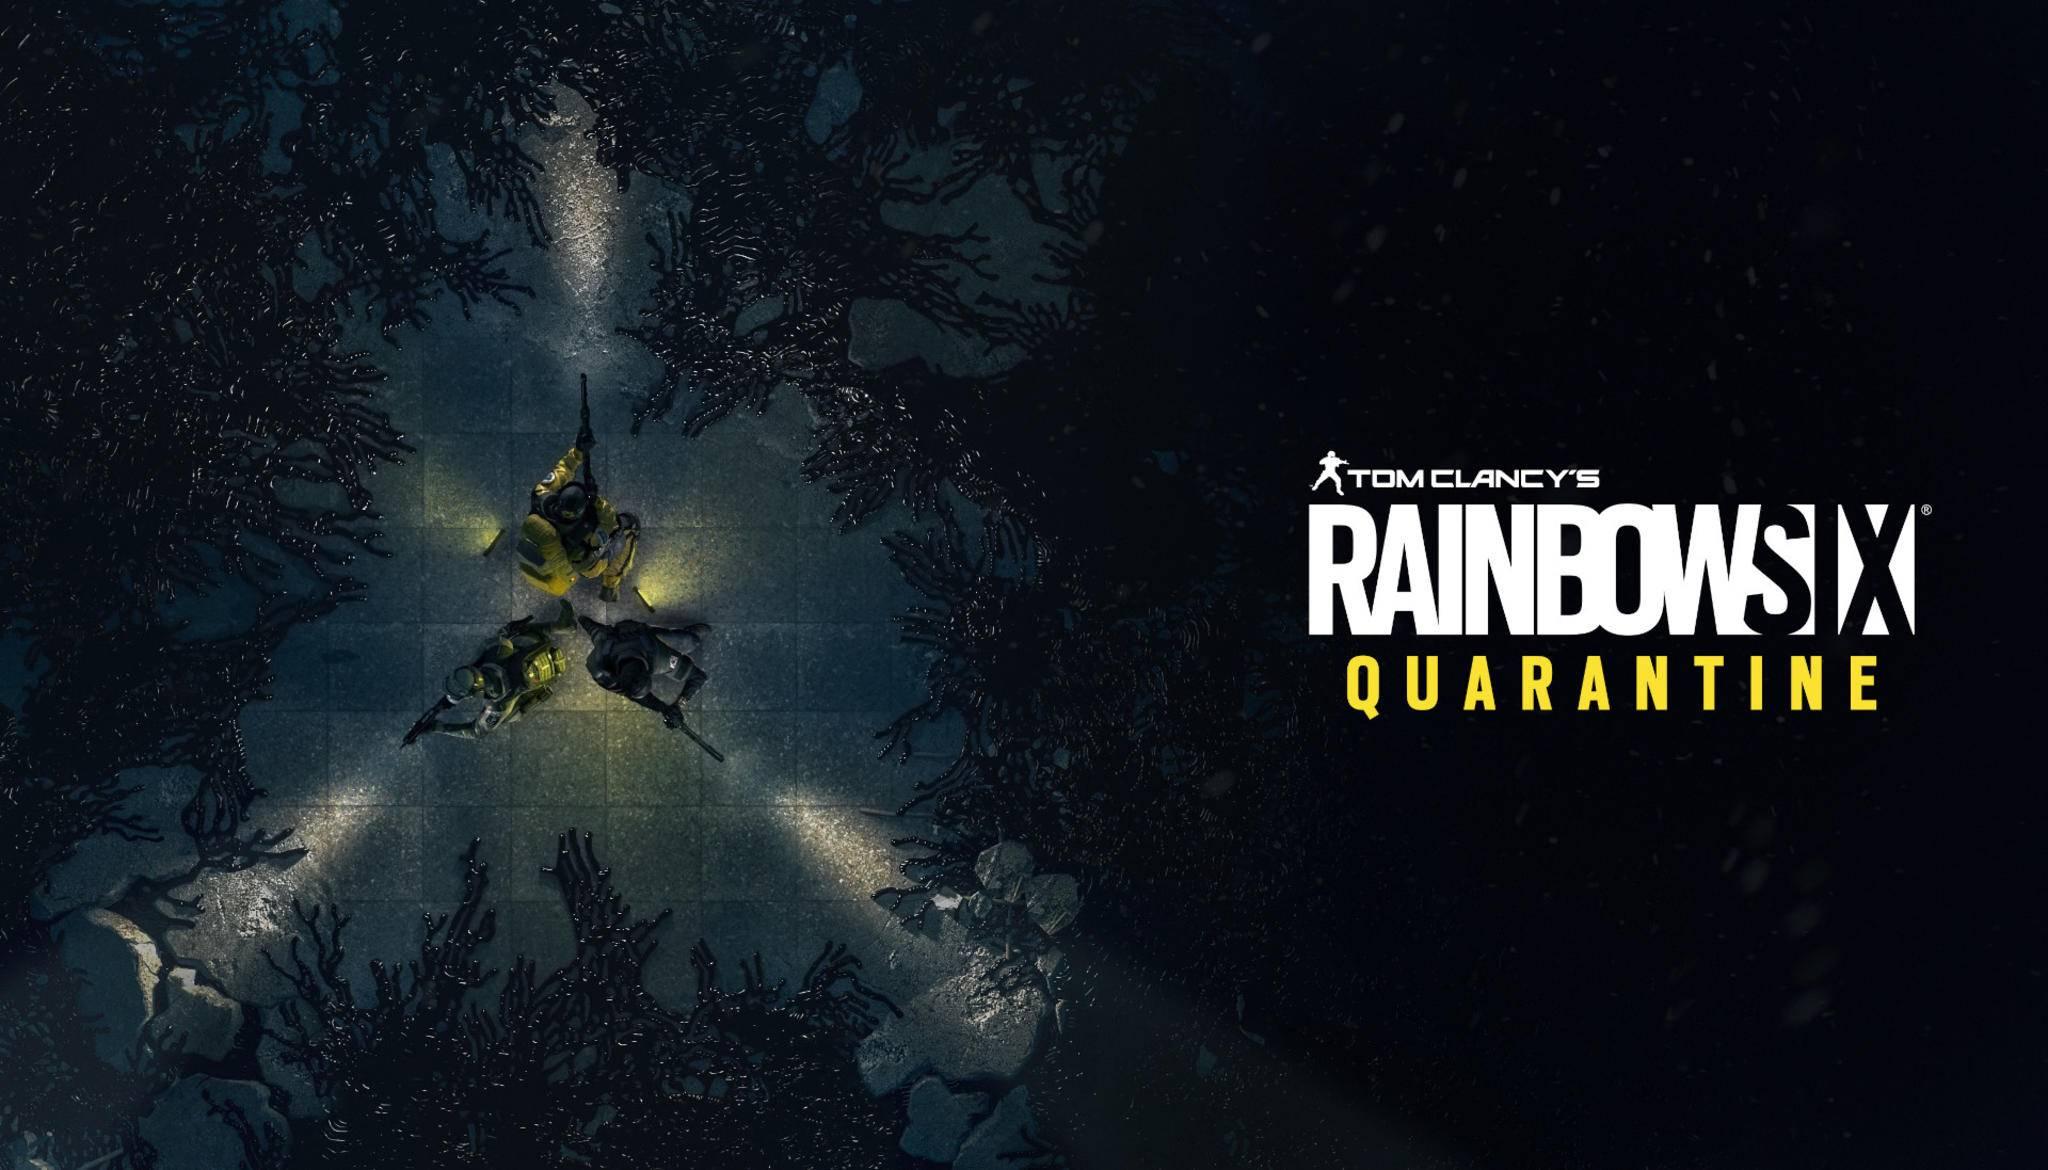 rainbow-six-quarantine-artwork